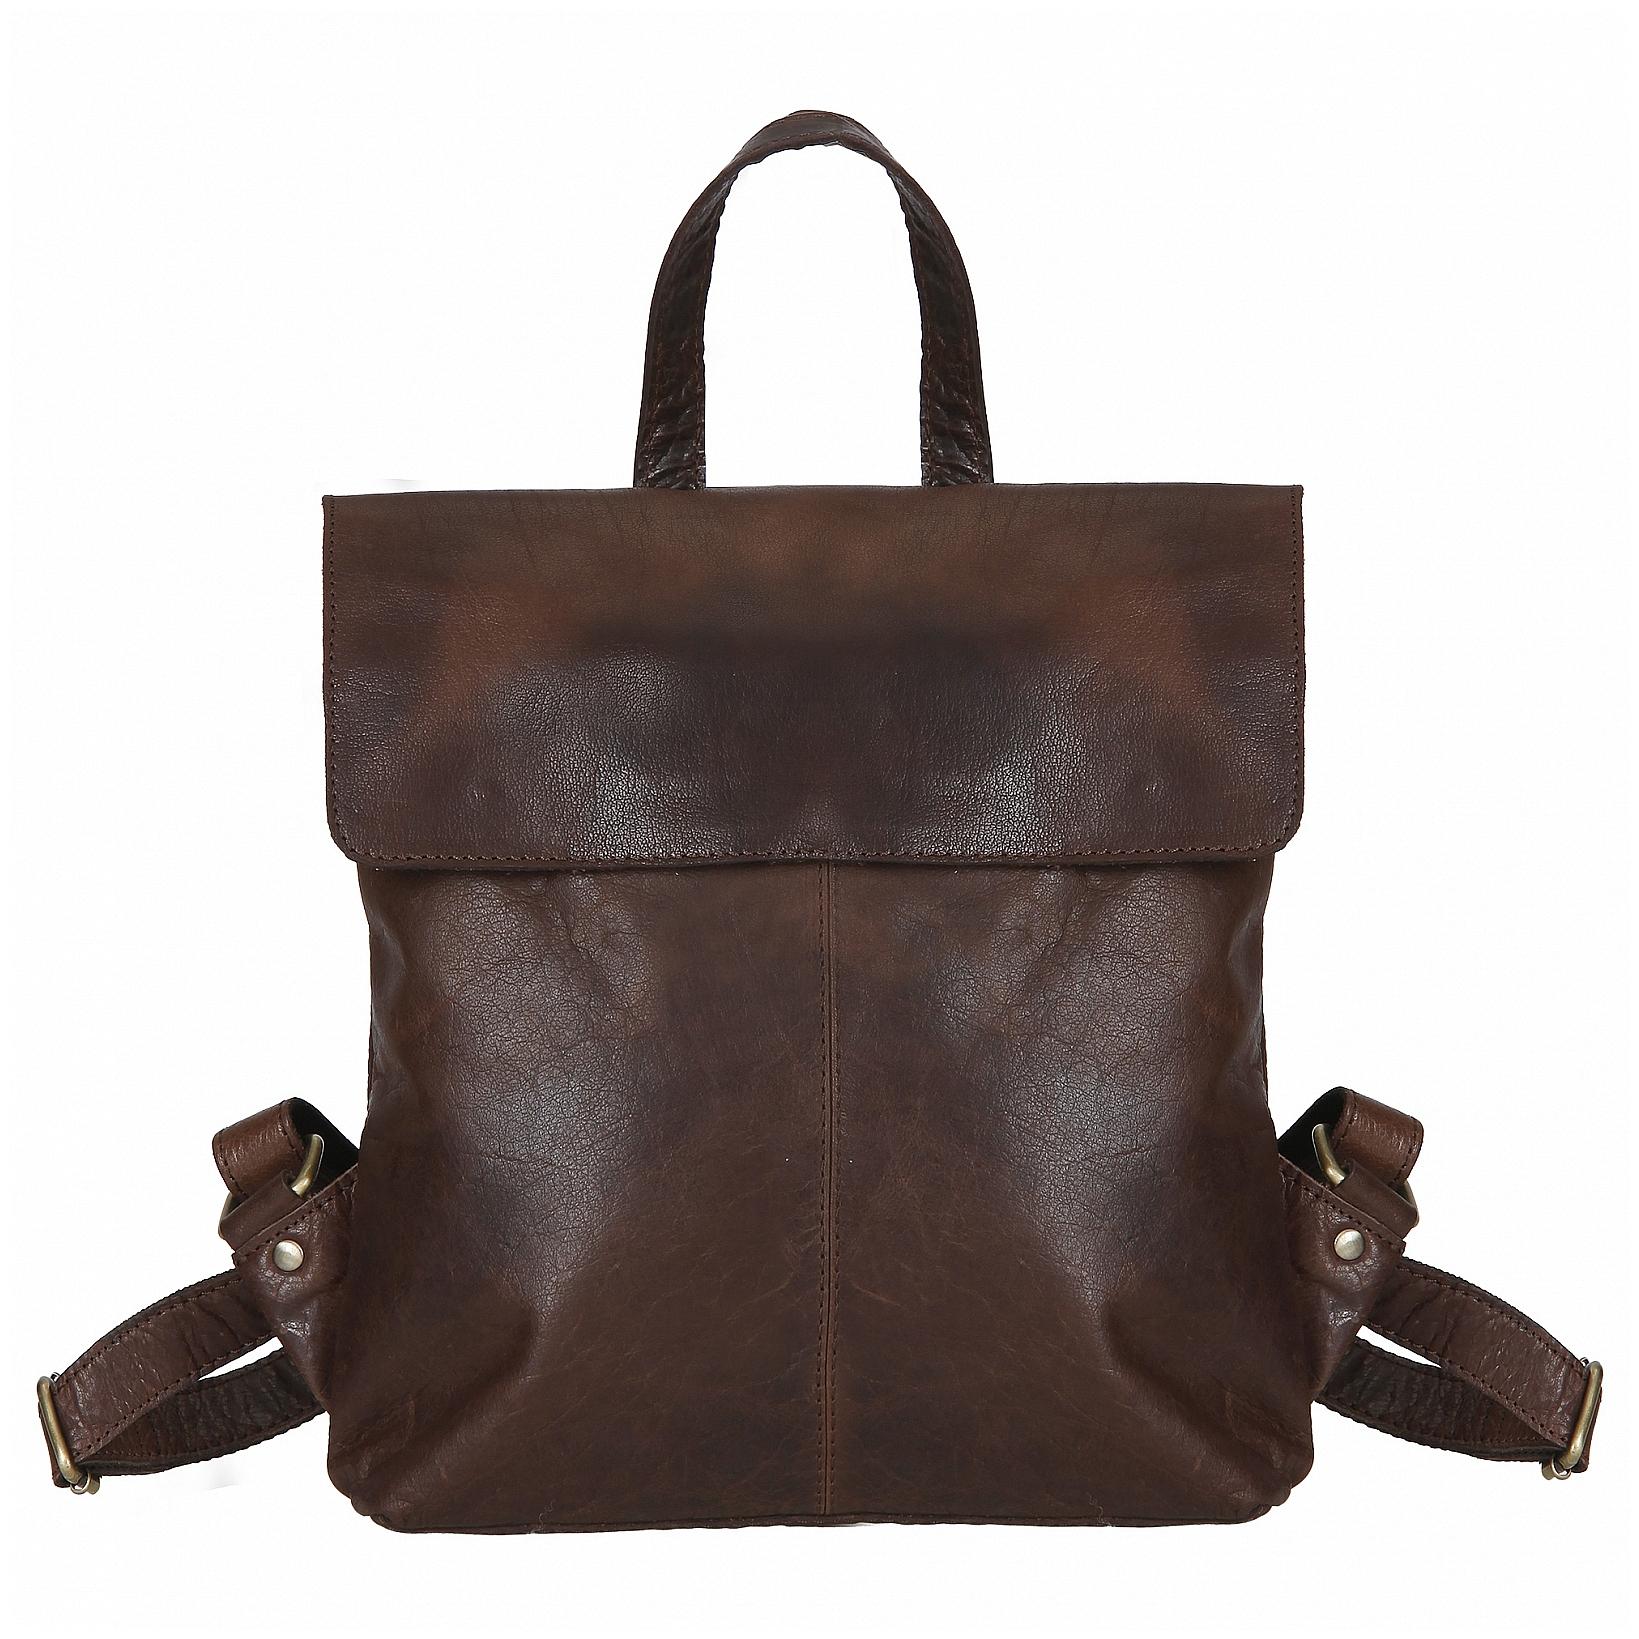 ESTELLE Dámský kožený batoh 1191 hnědý 8b2633df73